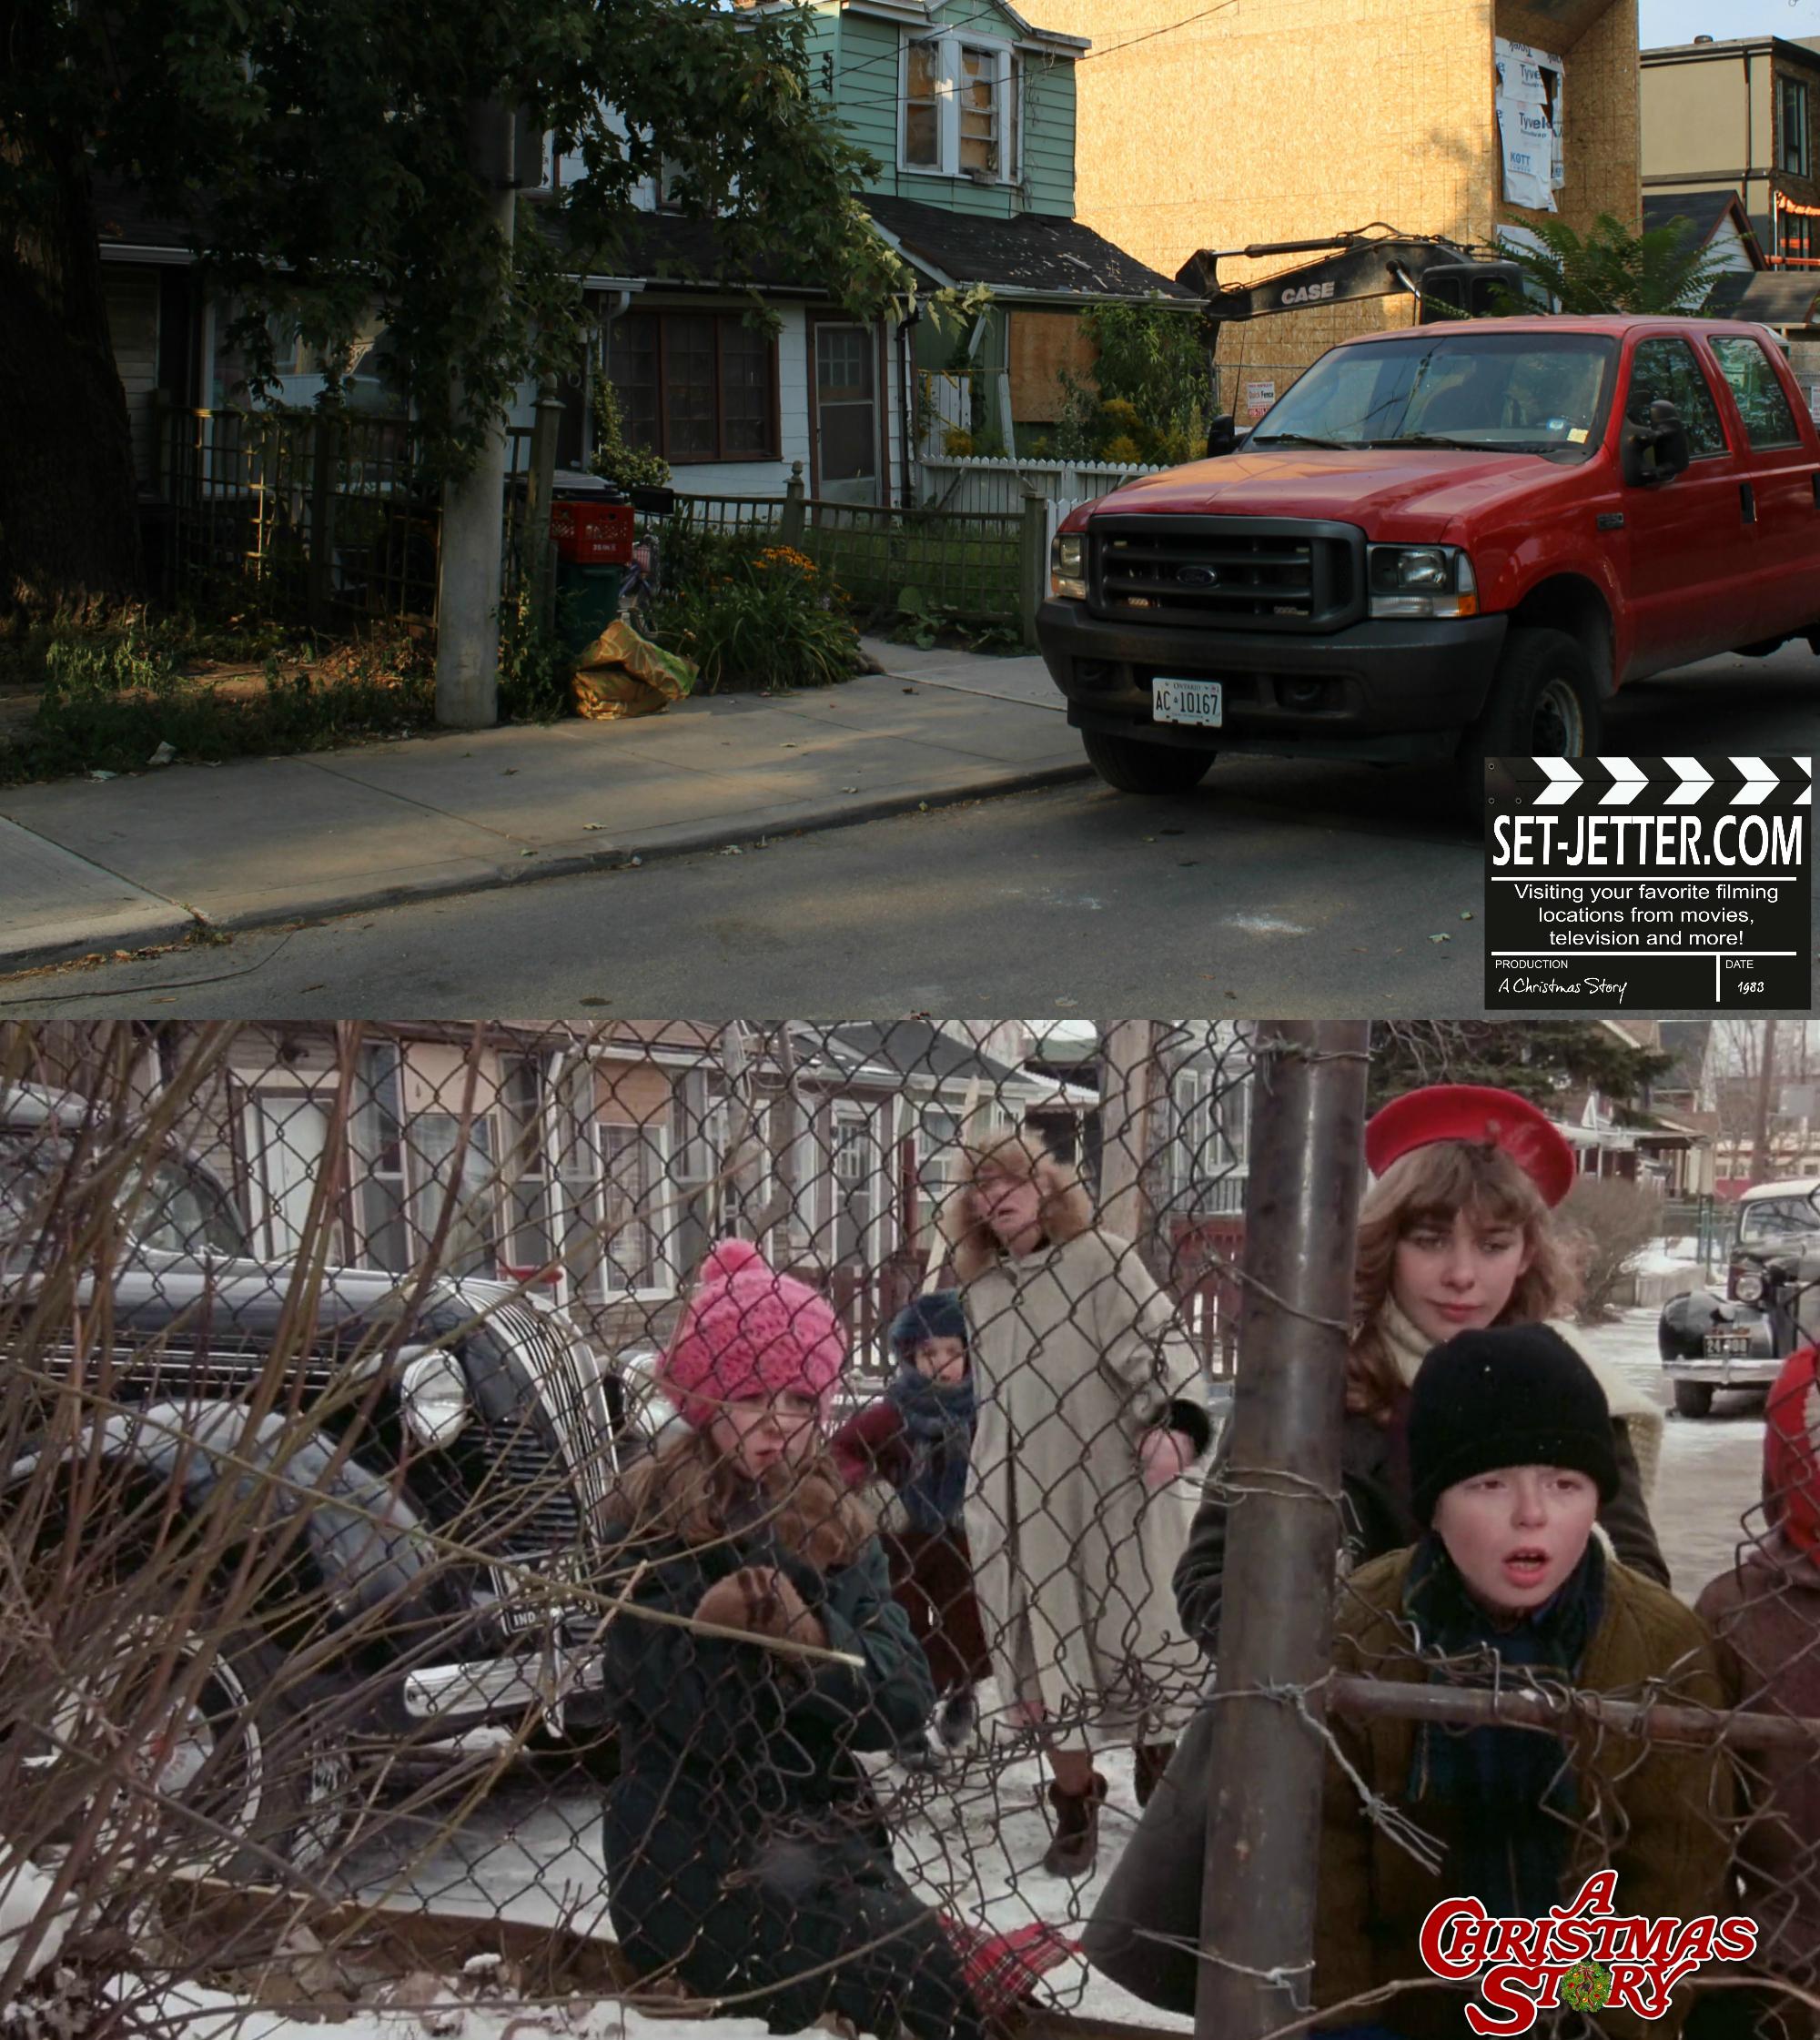 Christmas Story comparison 70.jpg